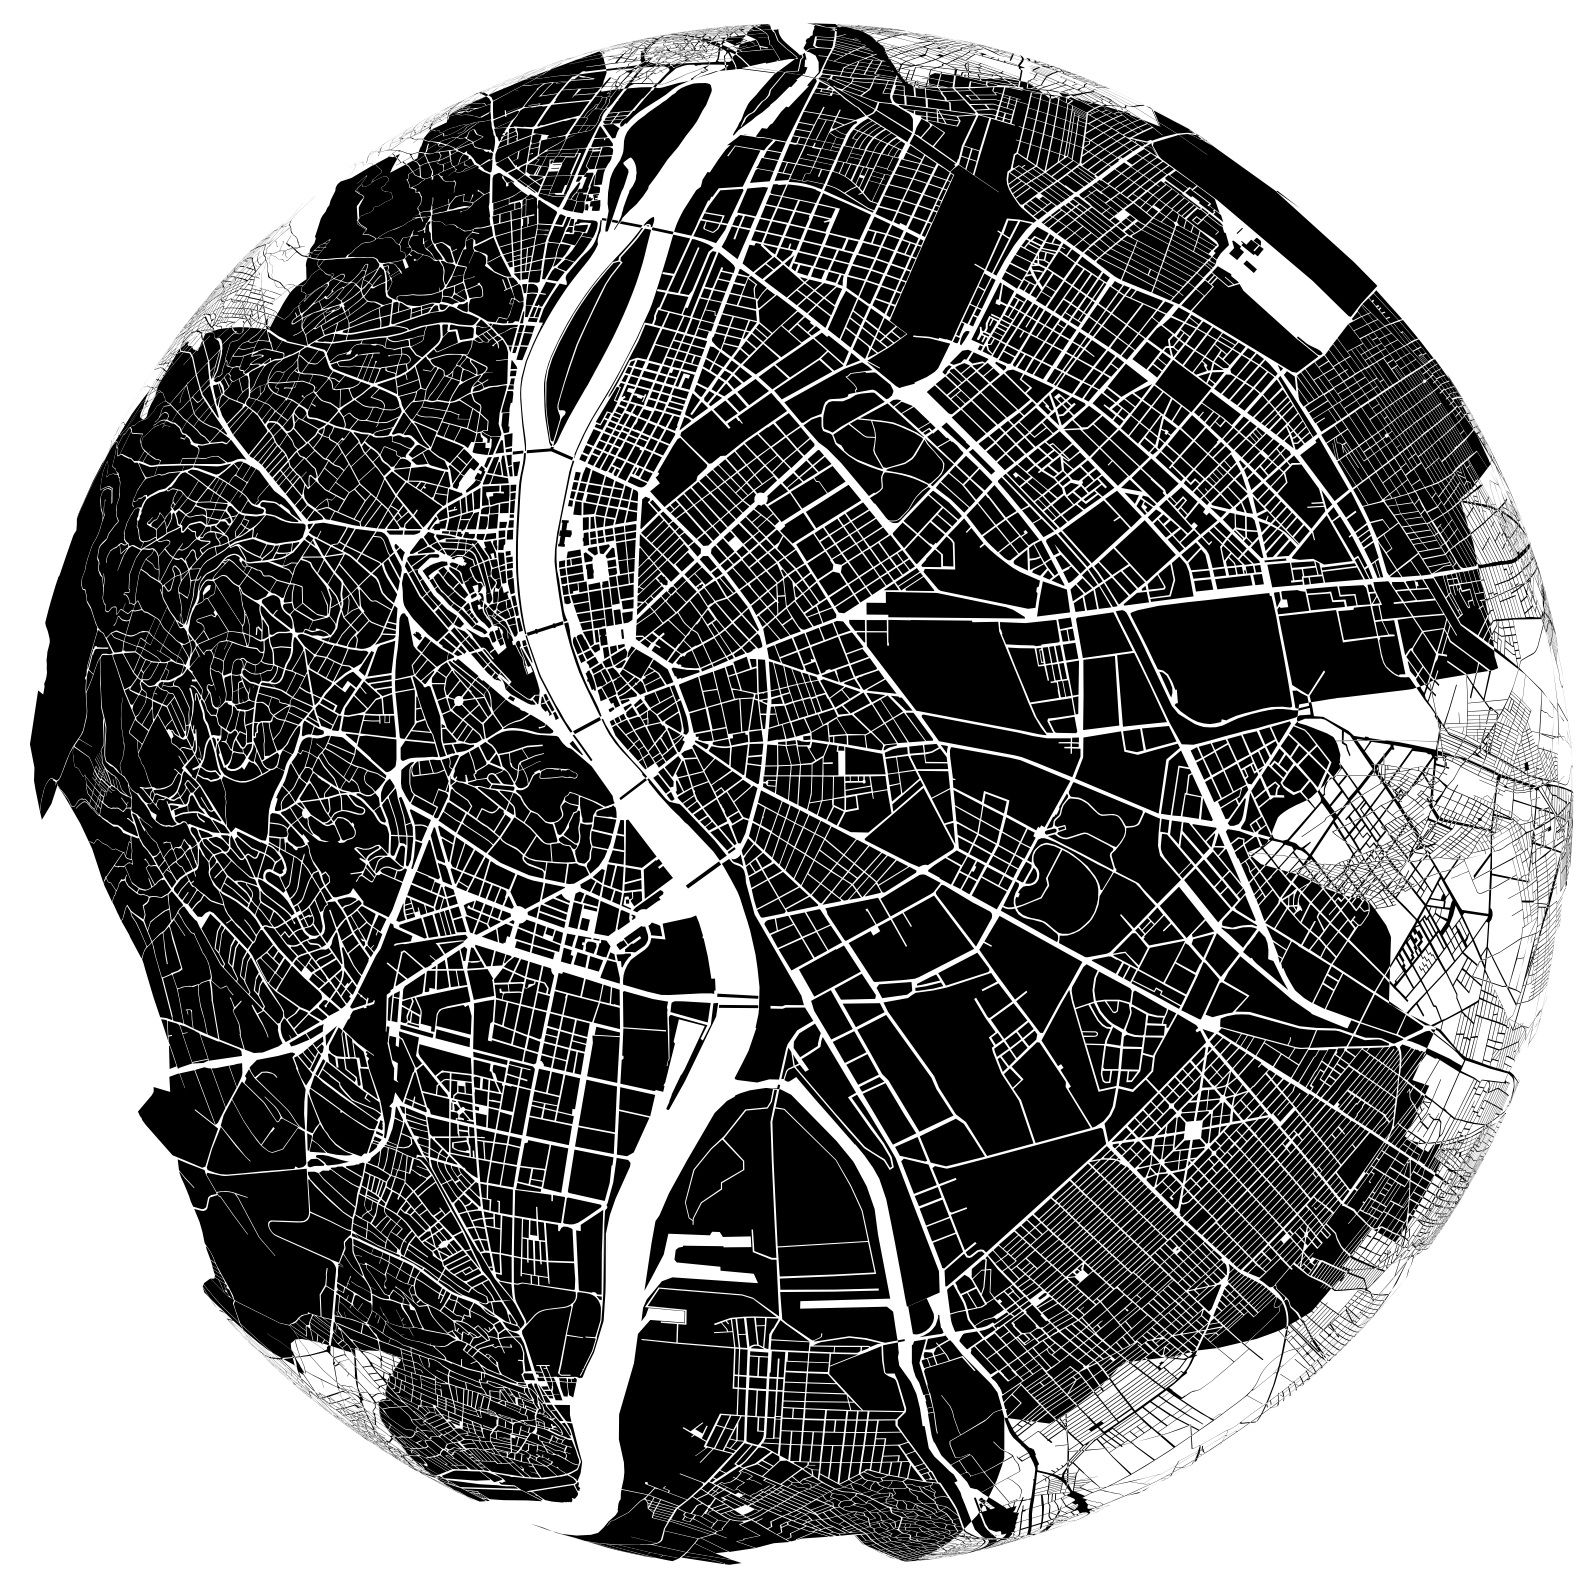 rhizome mapping - Google Search | Visual Mapping | Pinterest